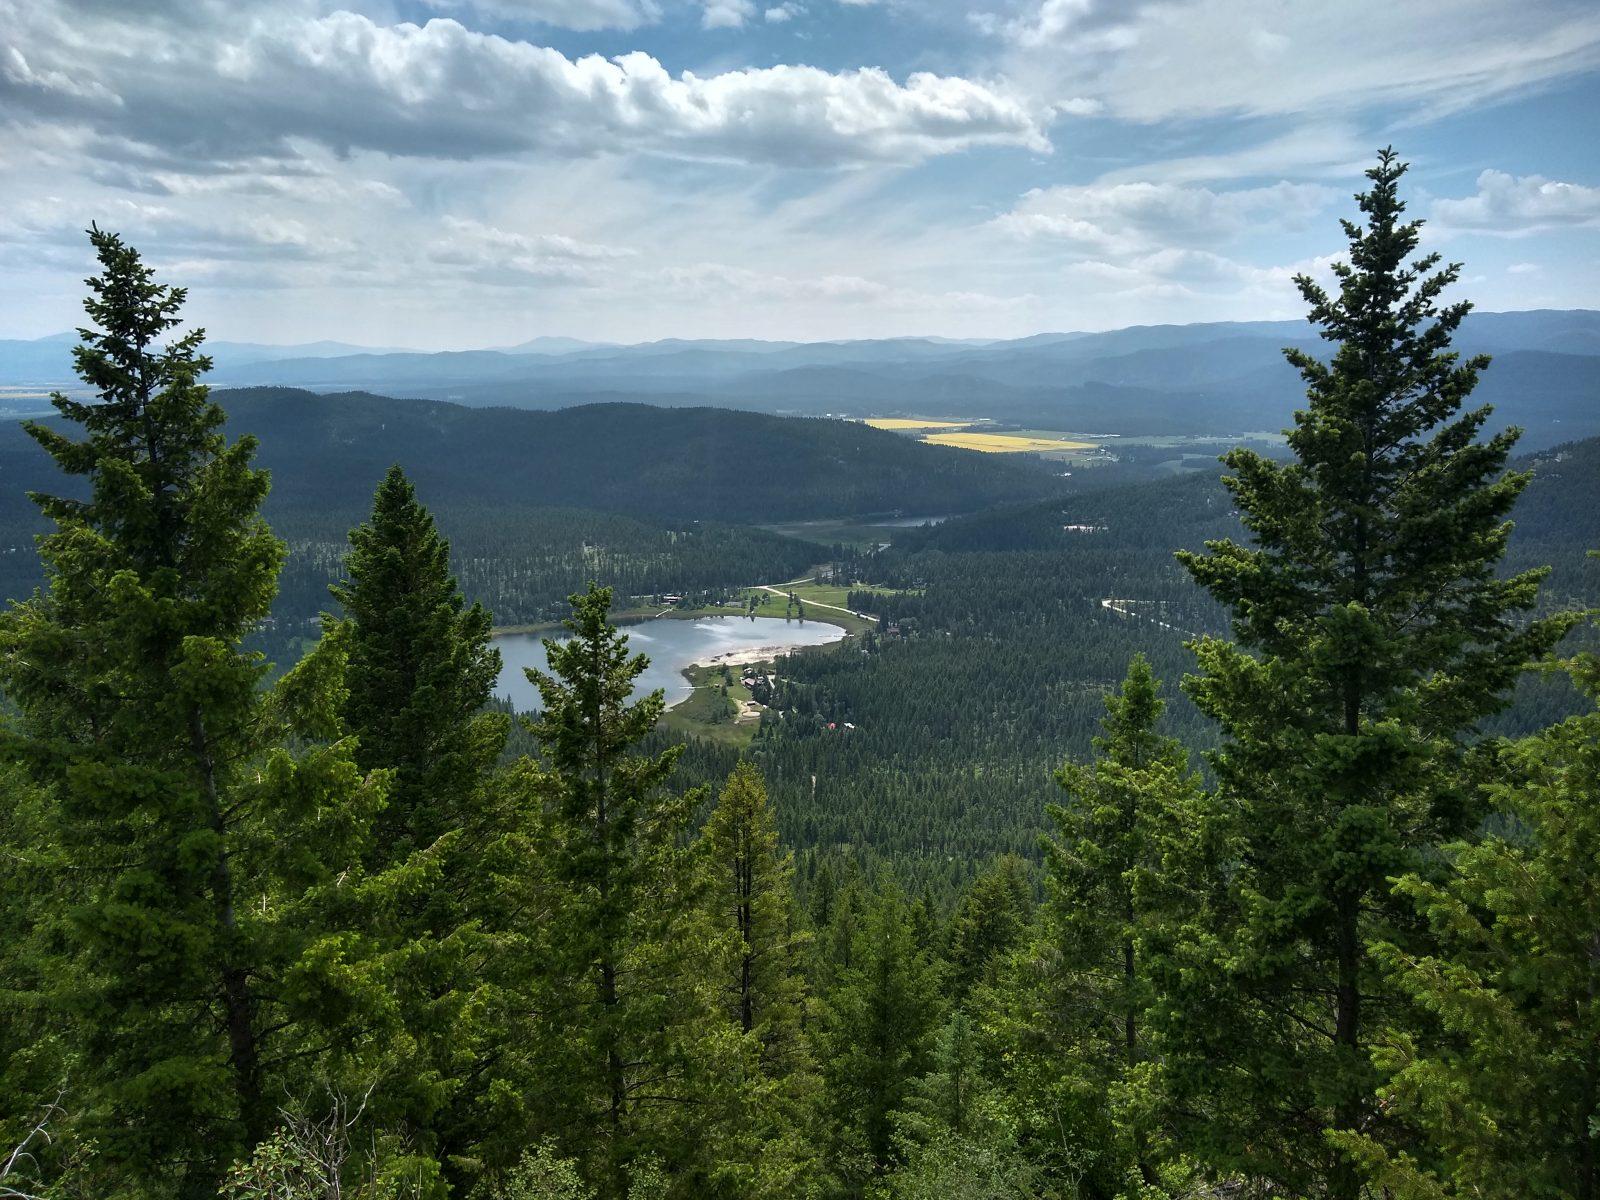 Skyles Lake - July 4, 2020